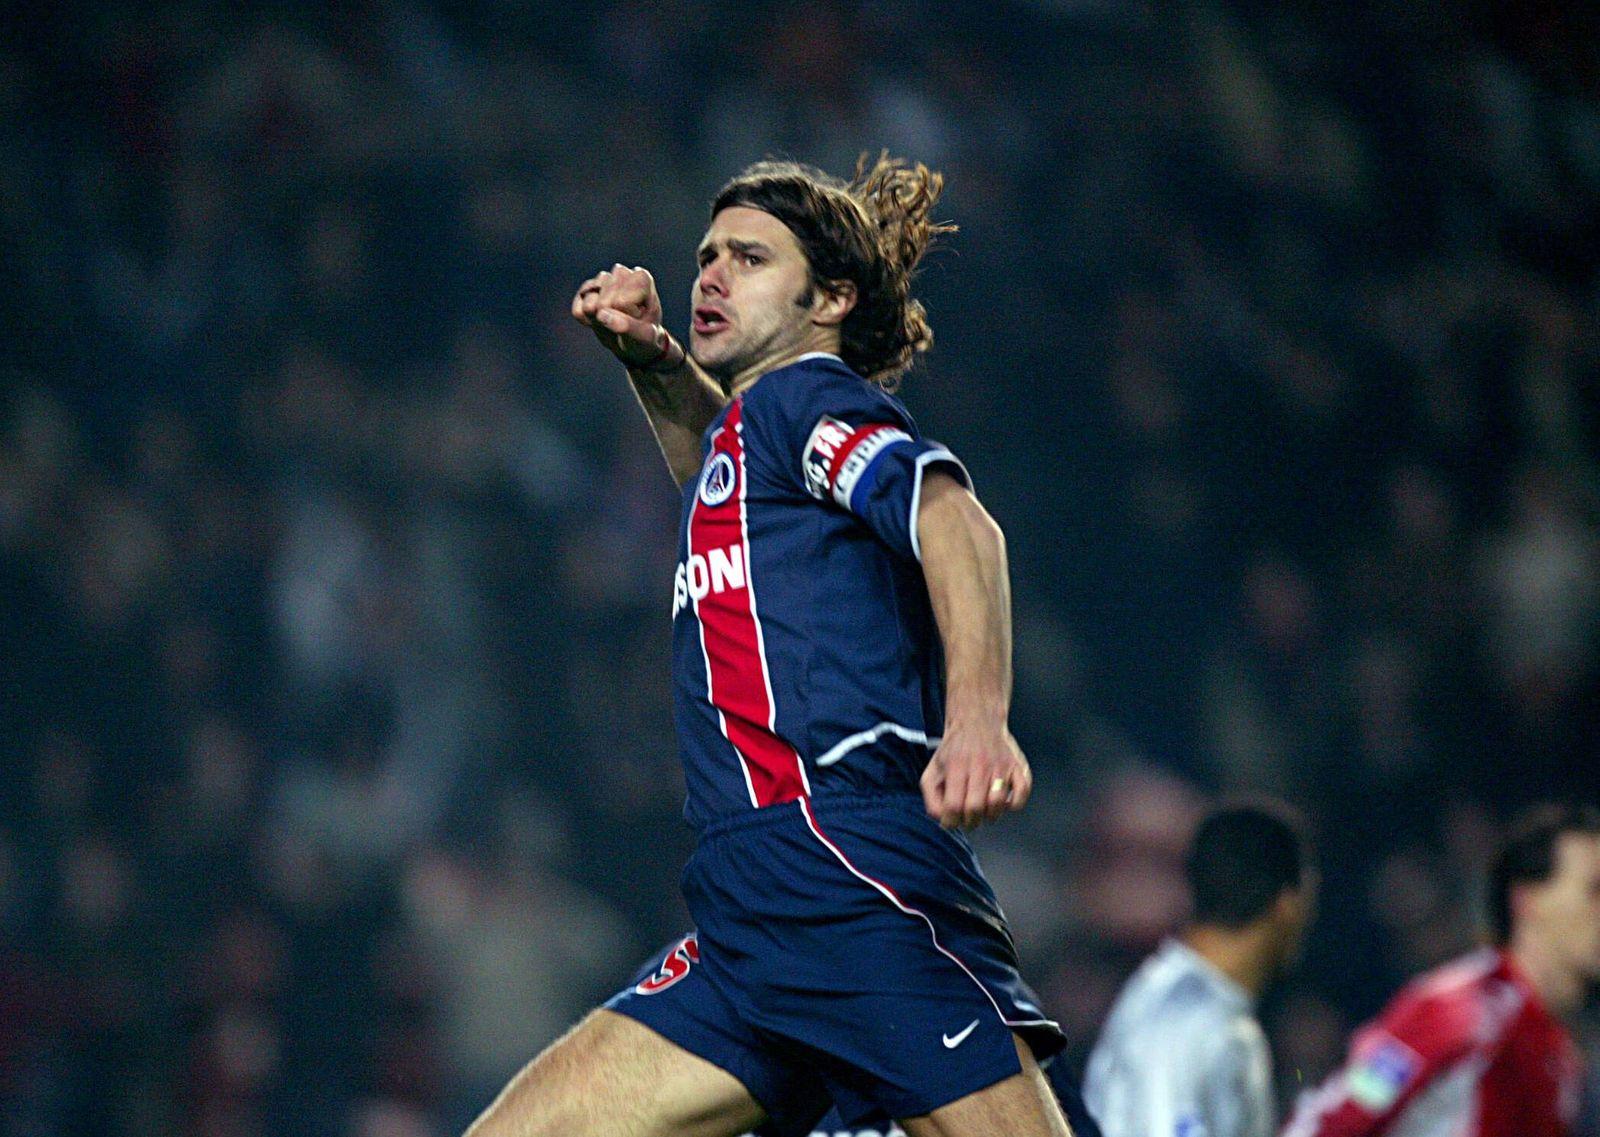 https www spiegel de sport fussball paris saint germain stellt mauricio pochettino als nachfolger von thomas tuchel vor a b80eba3a eaf7 4338 8ad5 6ee191f6523f